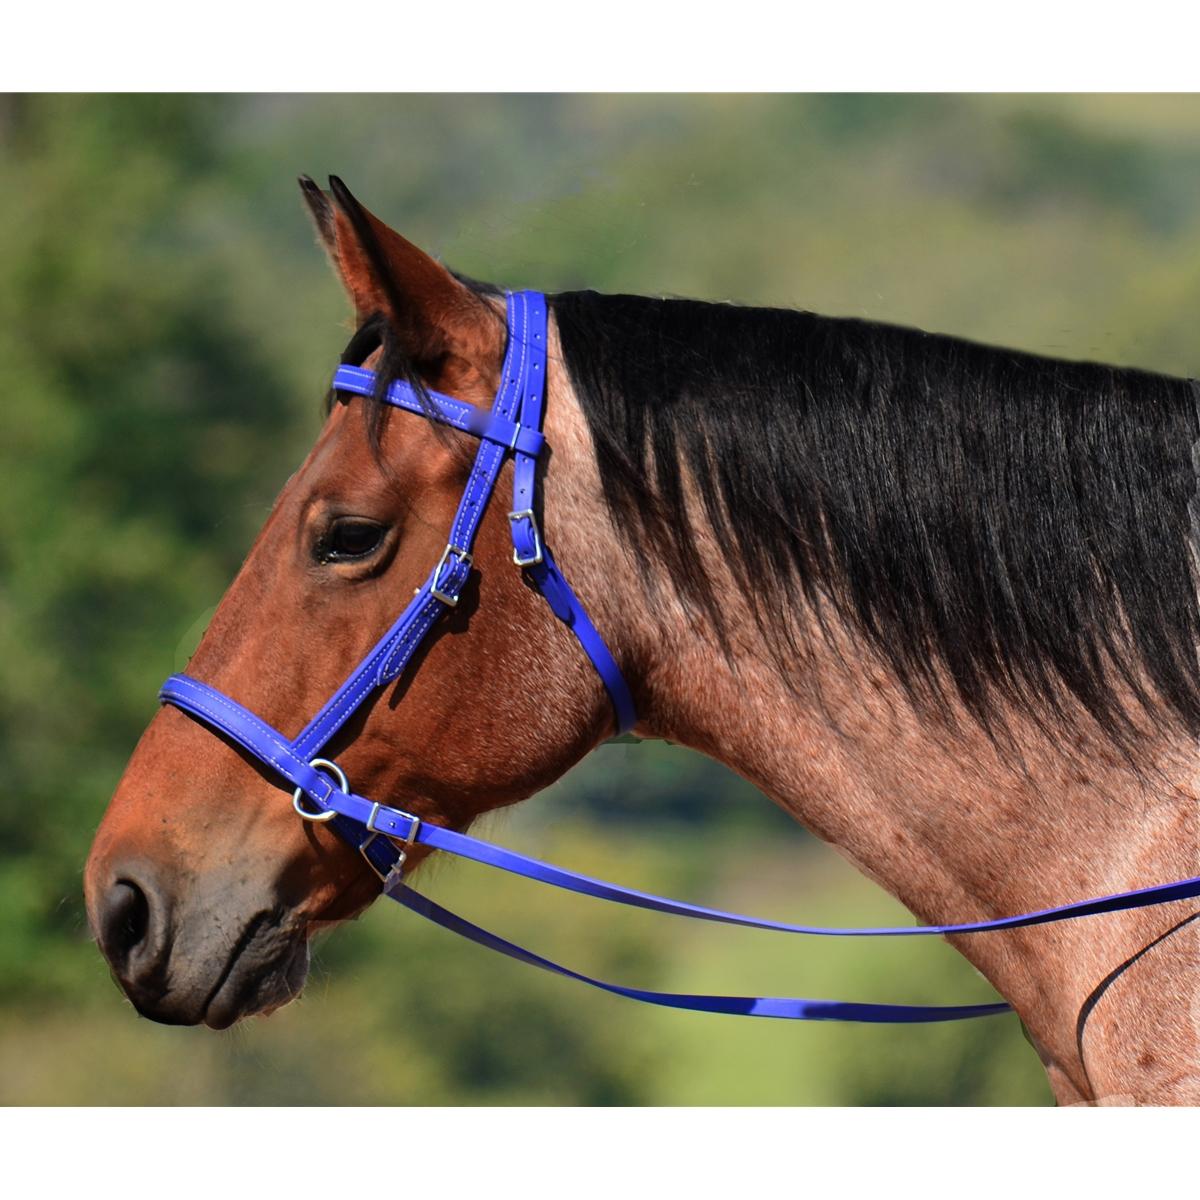 EFI2910 also Shetland moreover 11069130183 besides 361 together with Bates Dressage Saddle. on pony harness